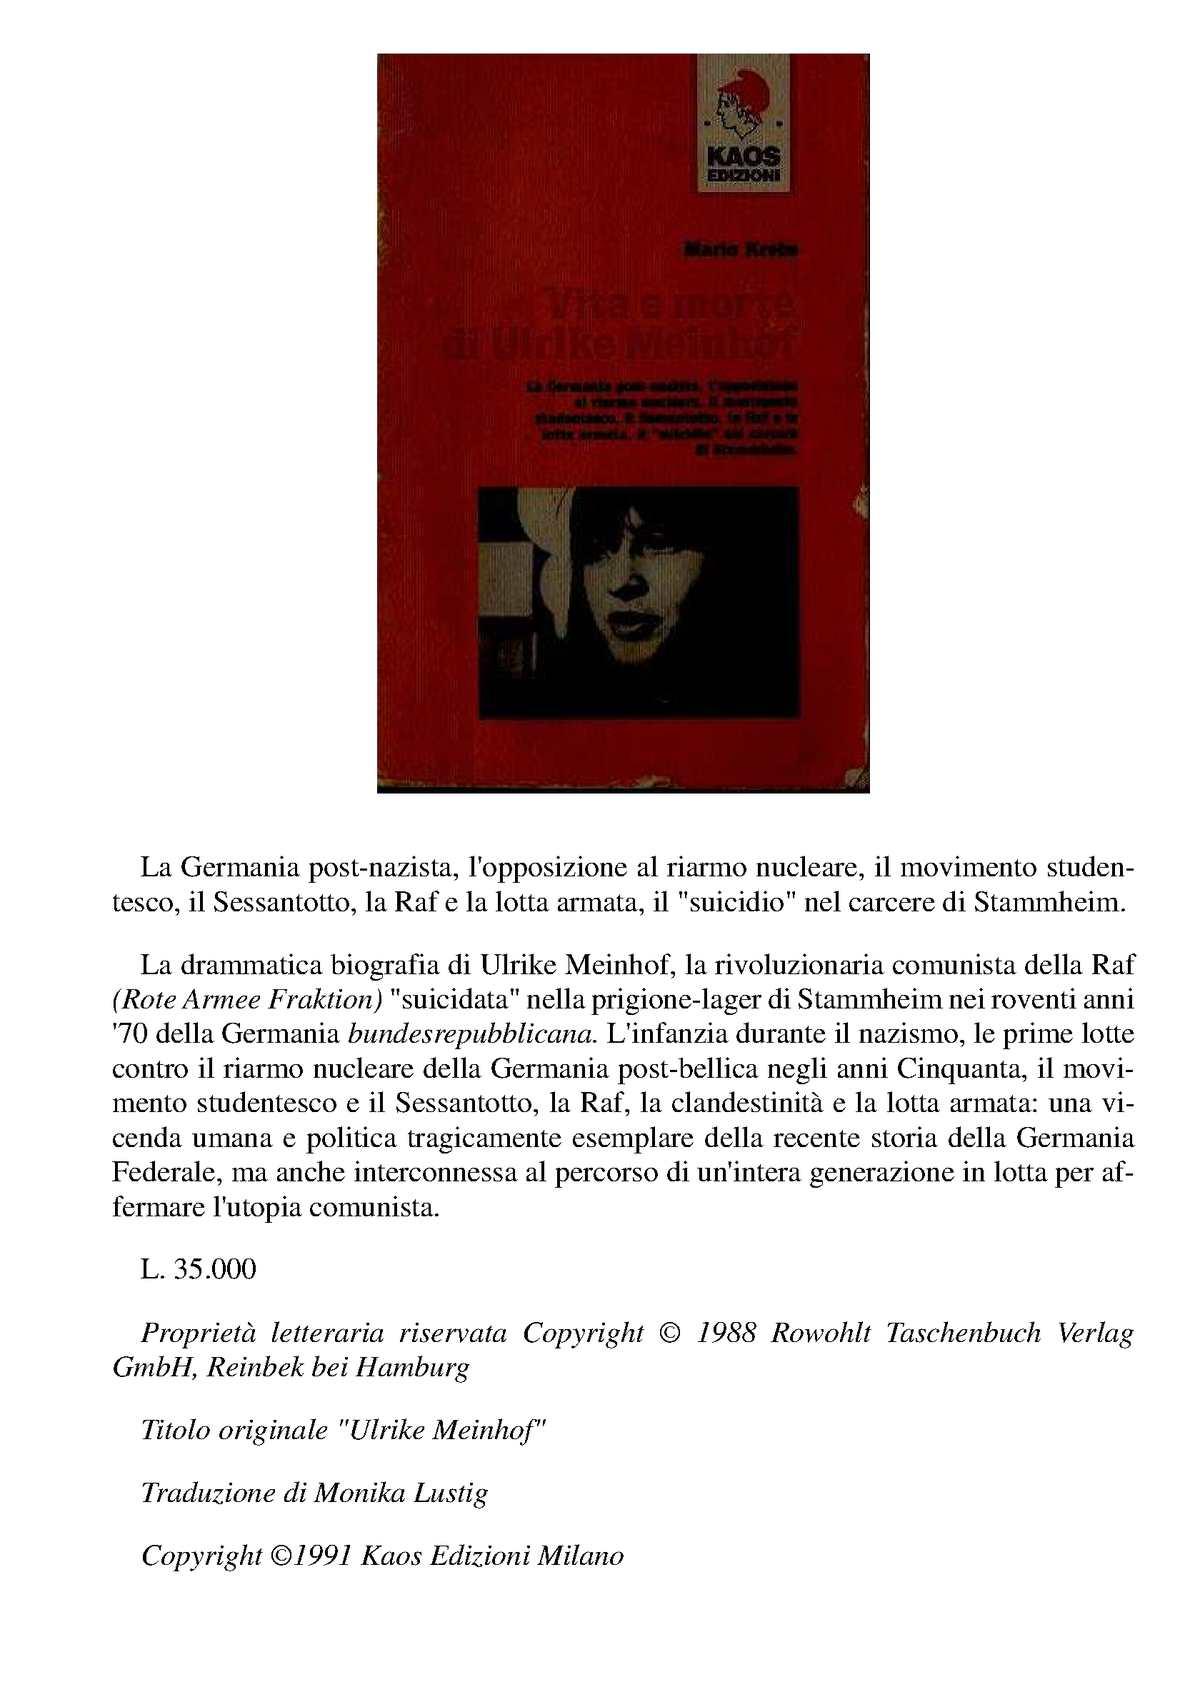 Calaméo - Vita E Morte Di Ulrike Meinhof - Mario Krebs f3b00e2d02c8